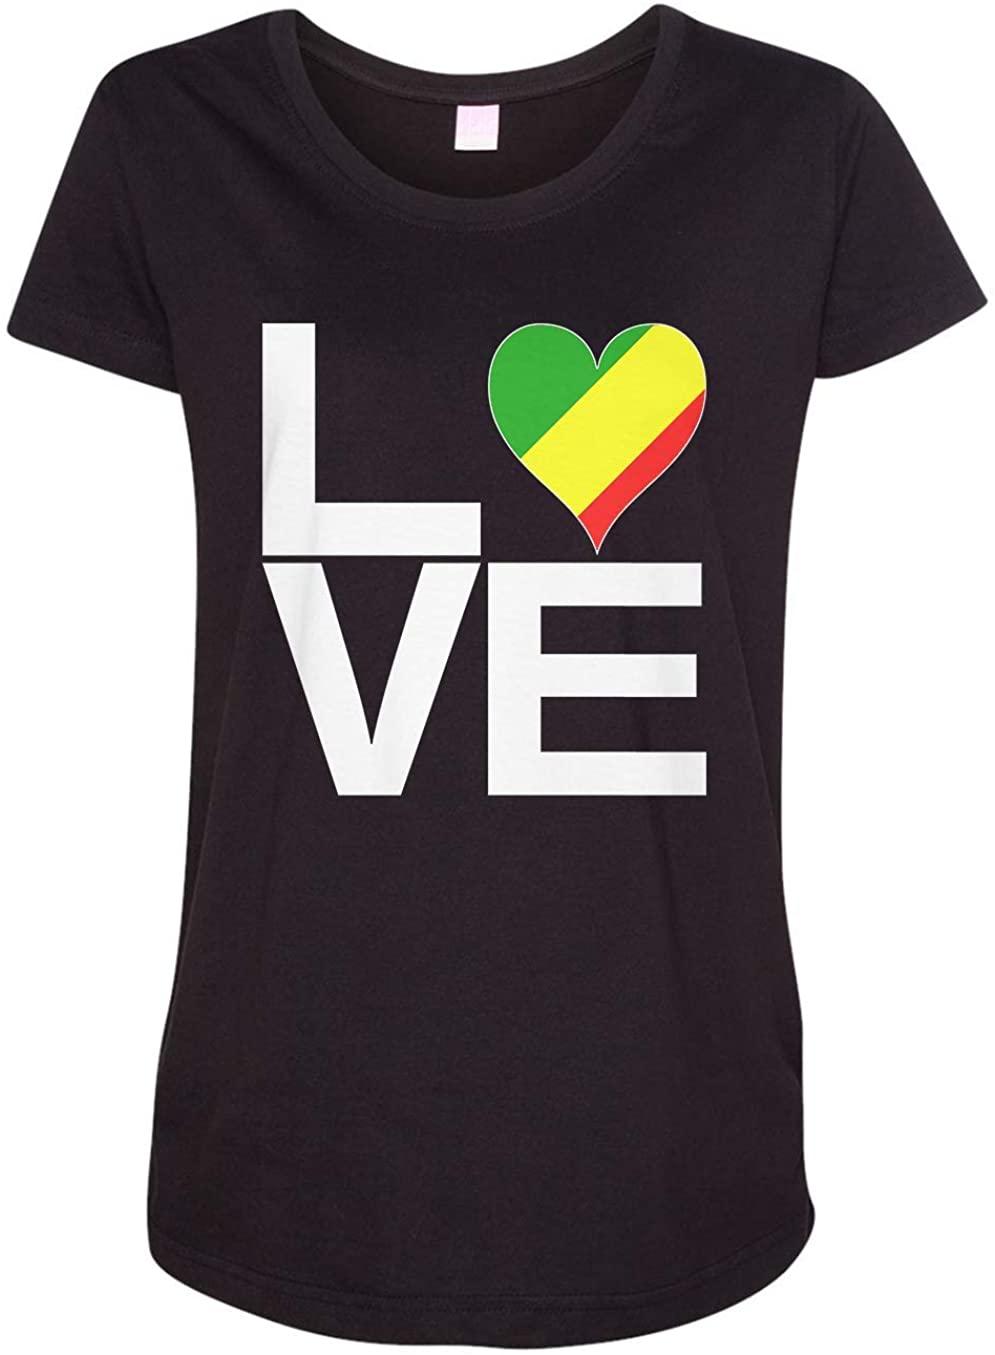 Tenacitee Ladies Love Block Congo Heart Maternity Shirt